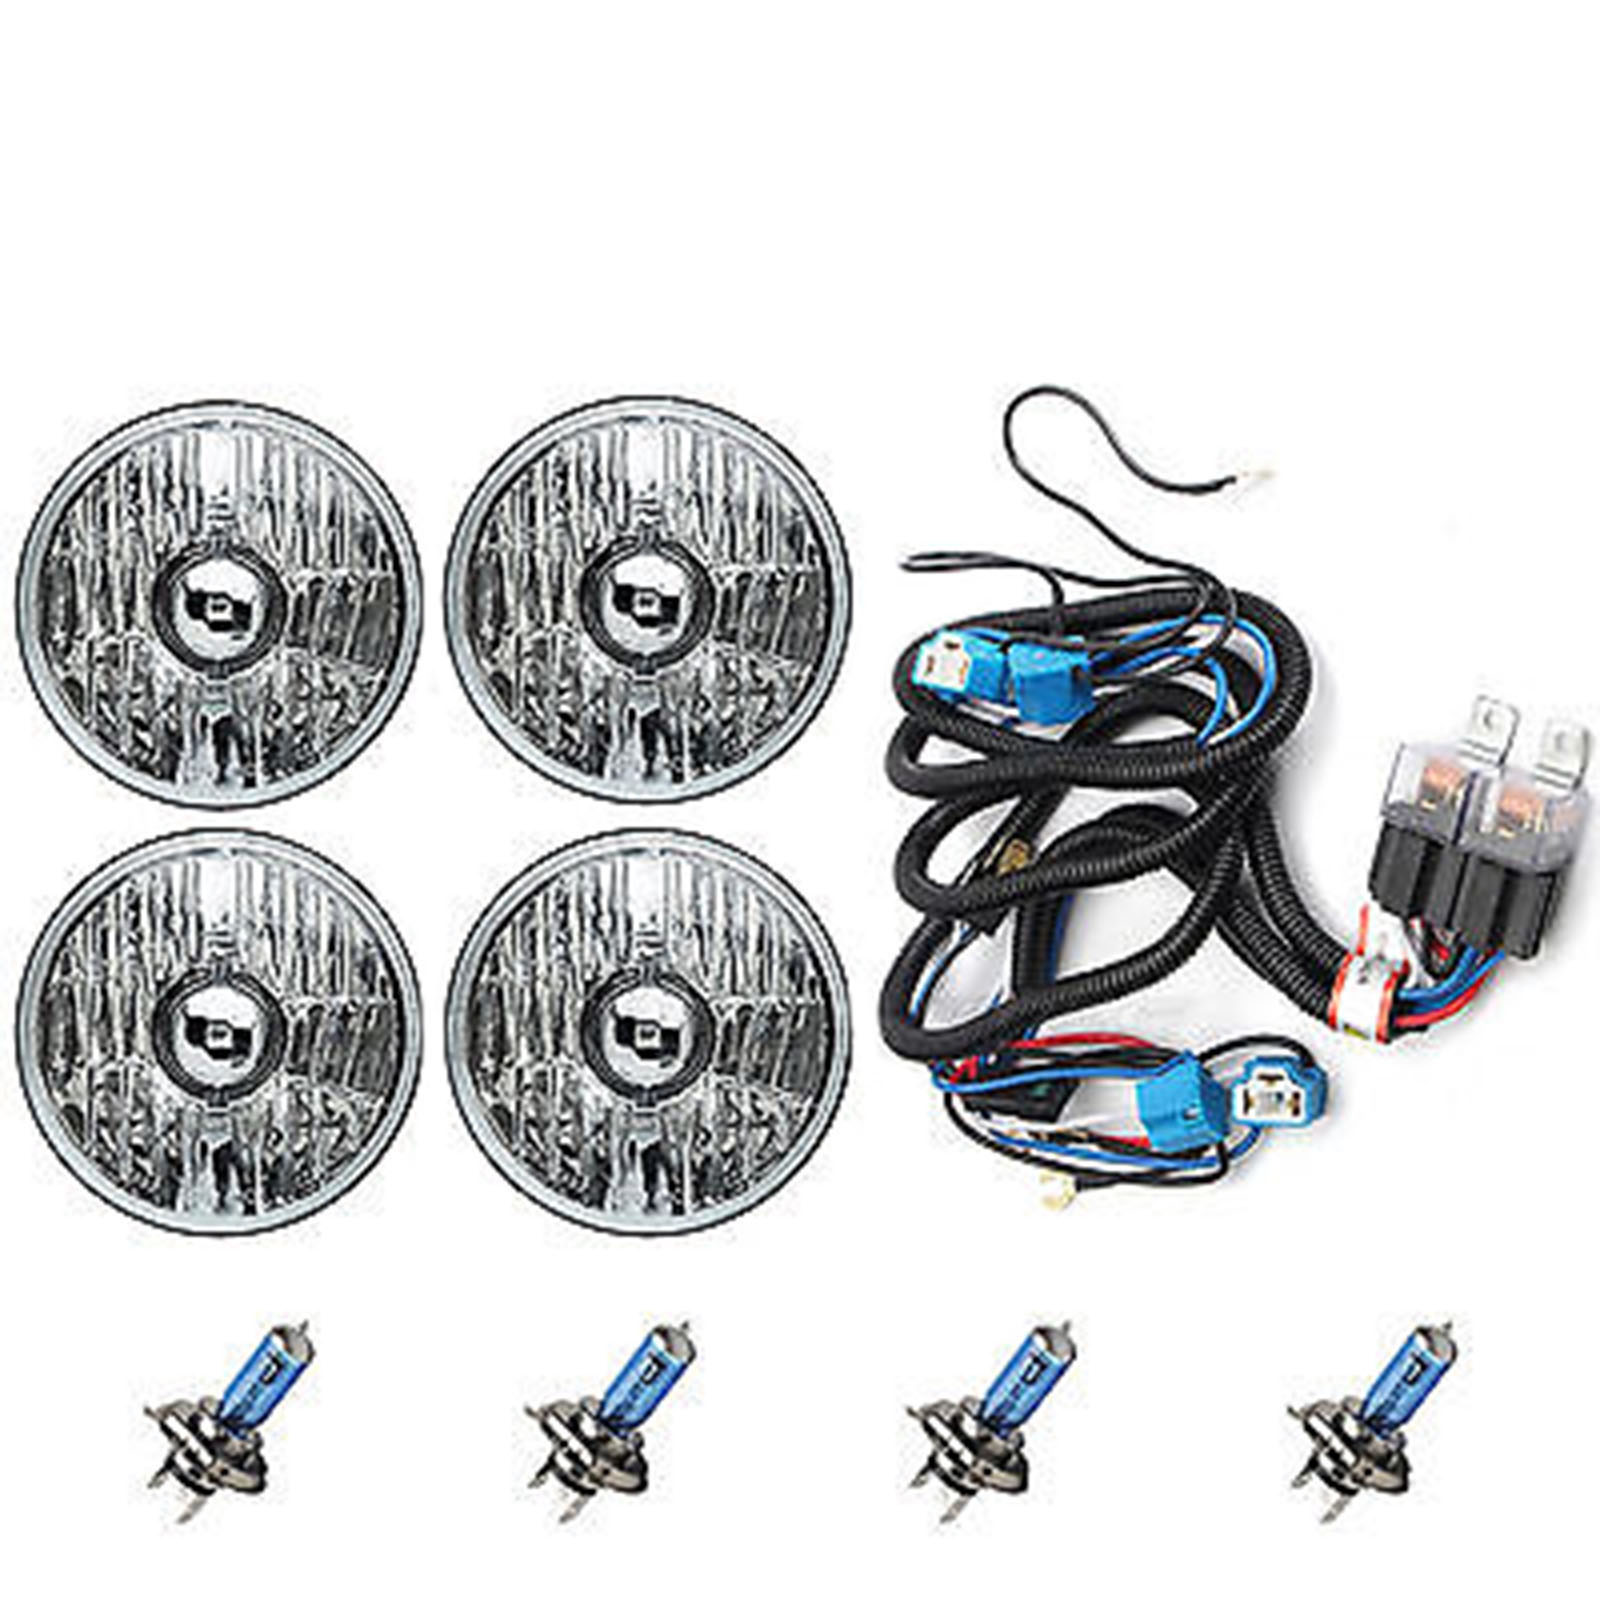 hight resolution of 5 3 4 crystal halogen headlight headlamp 100w sw light bulbs relay harness kit